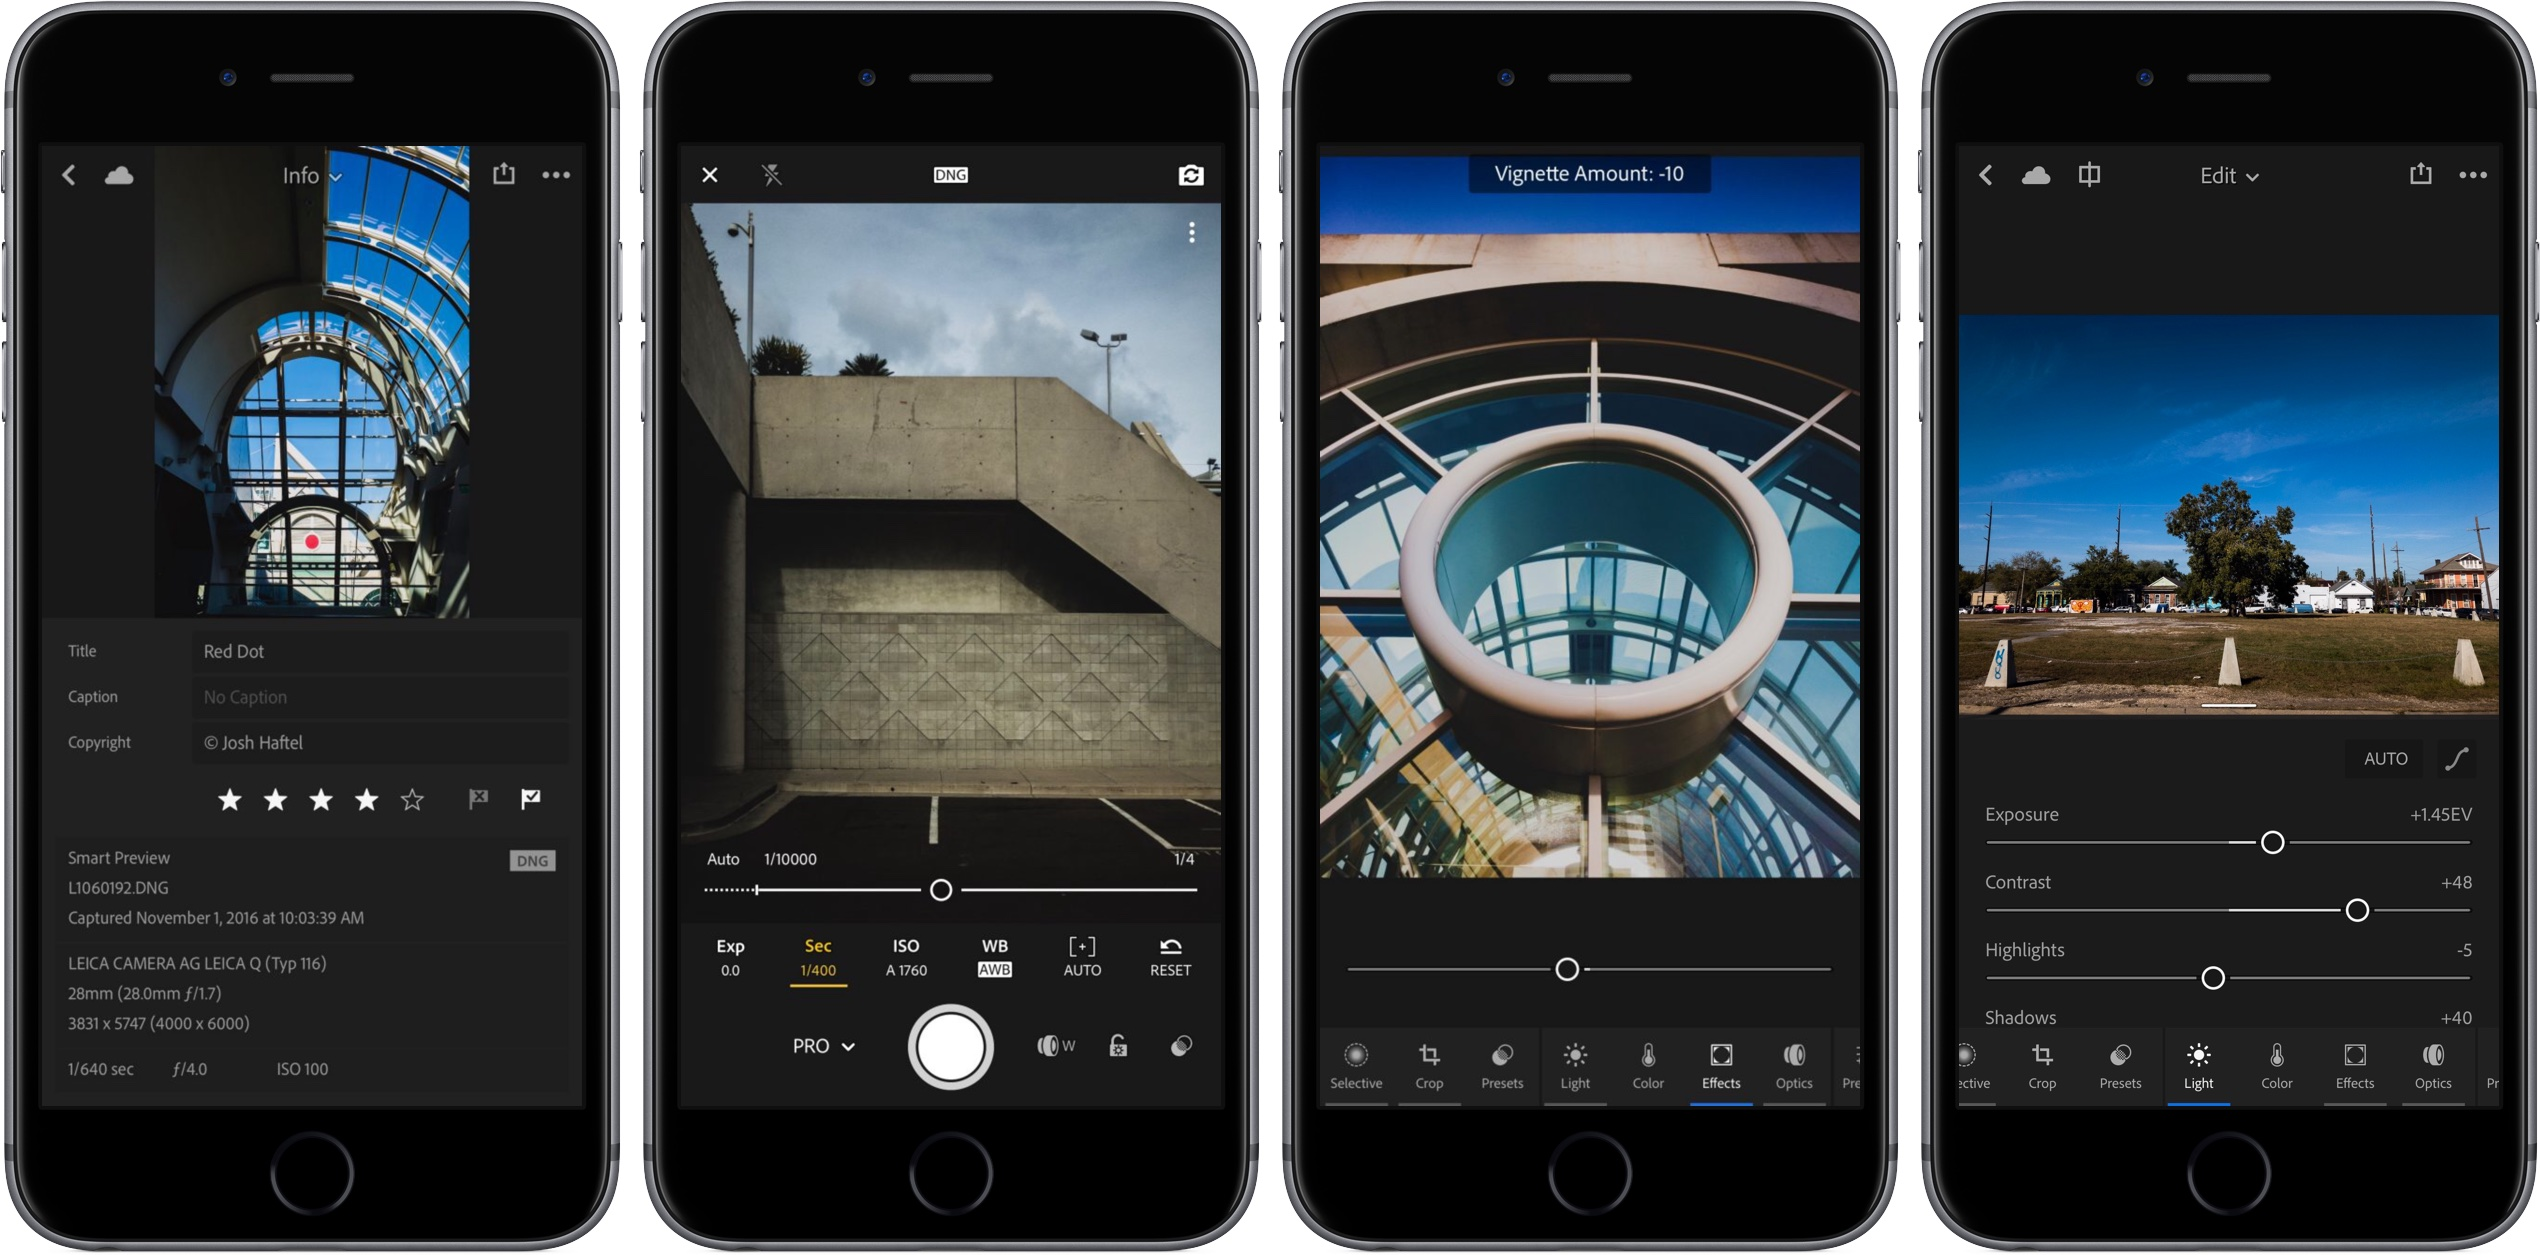 Captura de pantalla 001 de Lightroom 2.6 para iOS iPhone